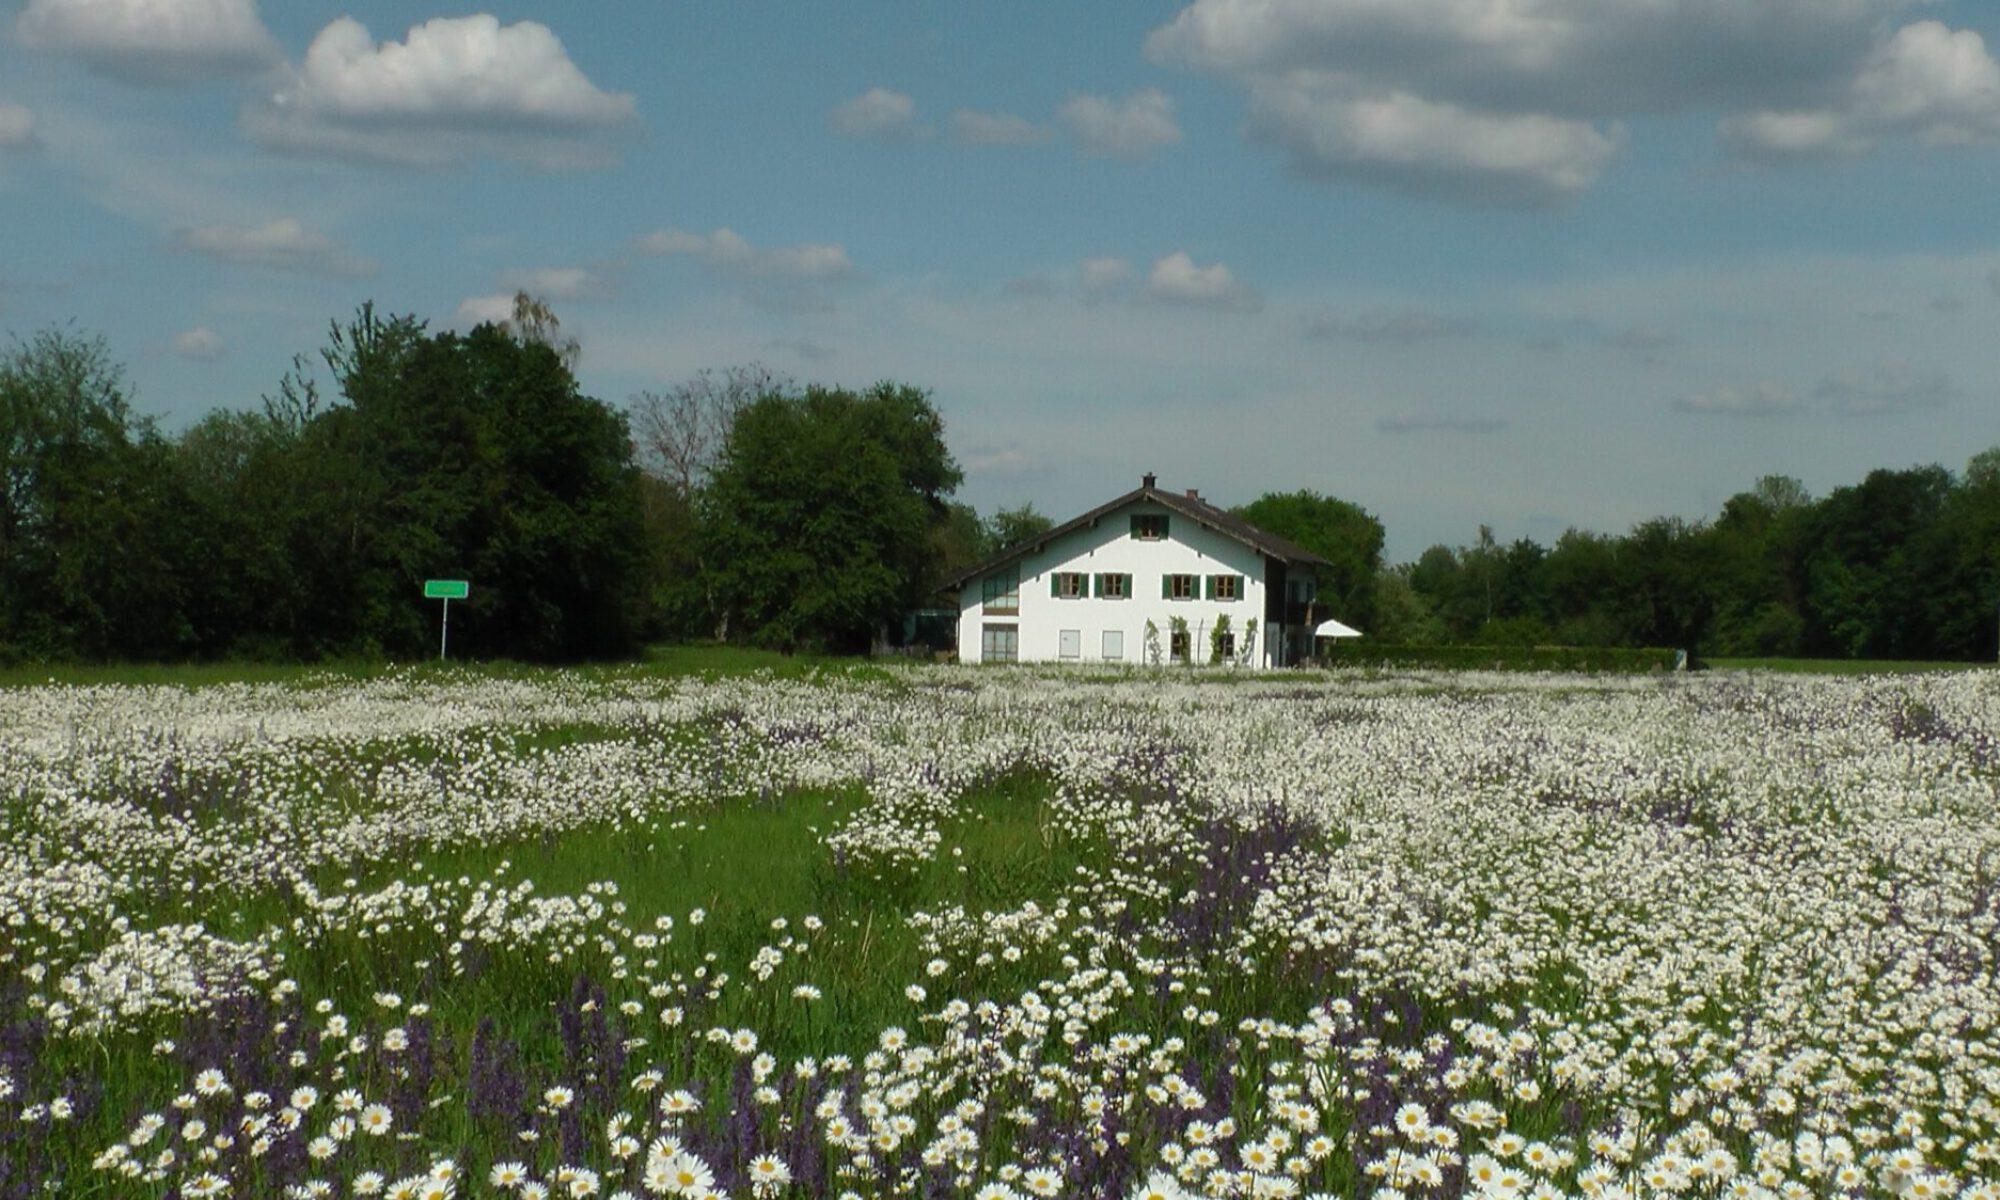 Gartenbauverein Margarethenberg-Hirten